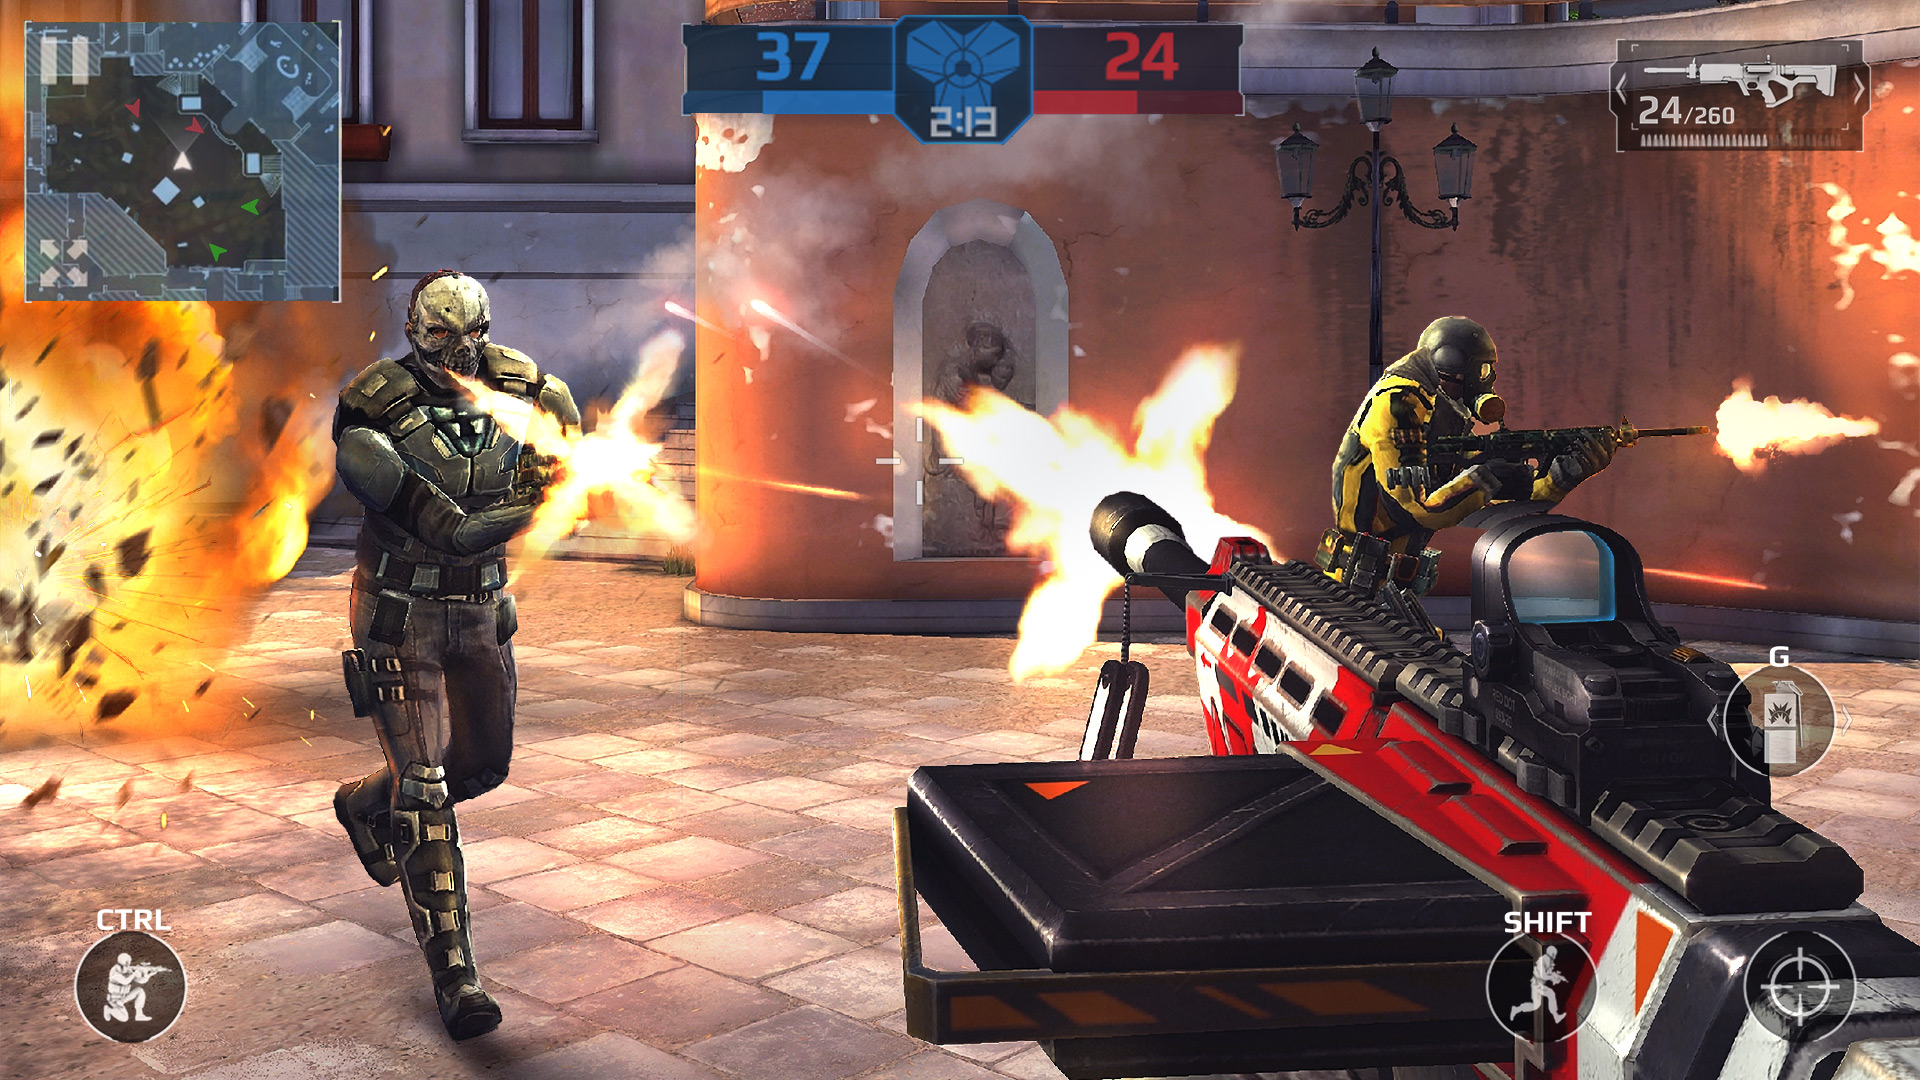 descargar modern combat 5 apk full español gratis